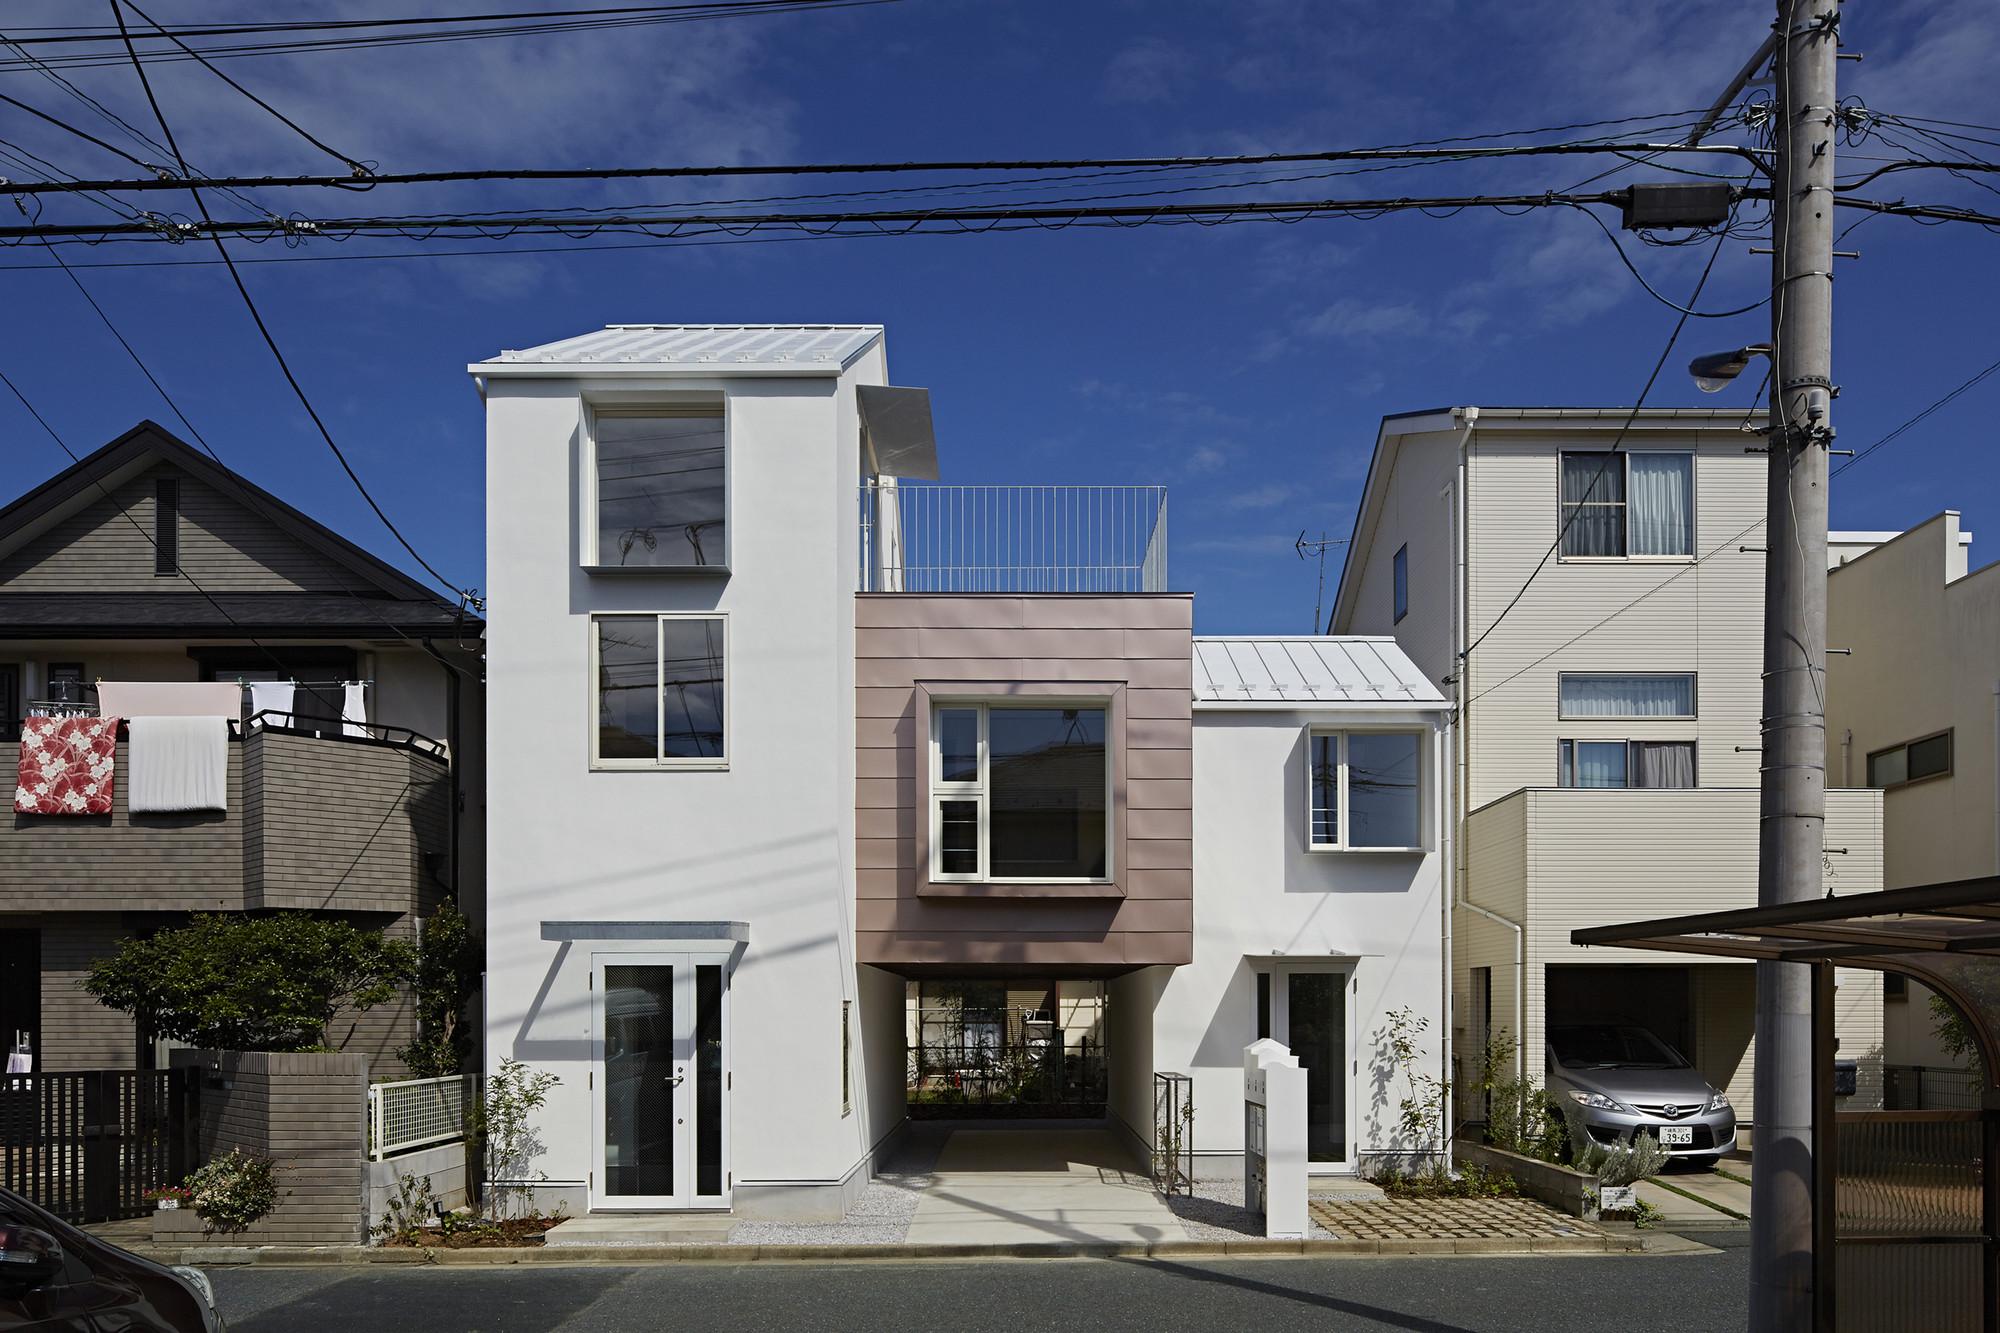 Sandwich Apartment  / Ikeda Yukie Architects, © Koichi Torimura